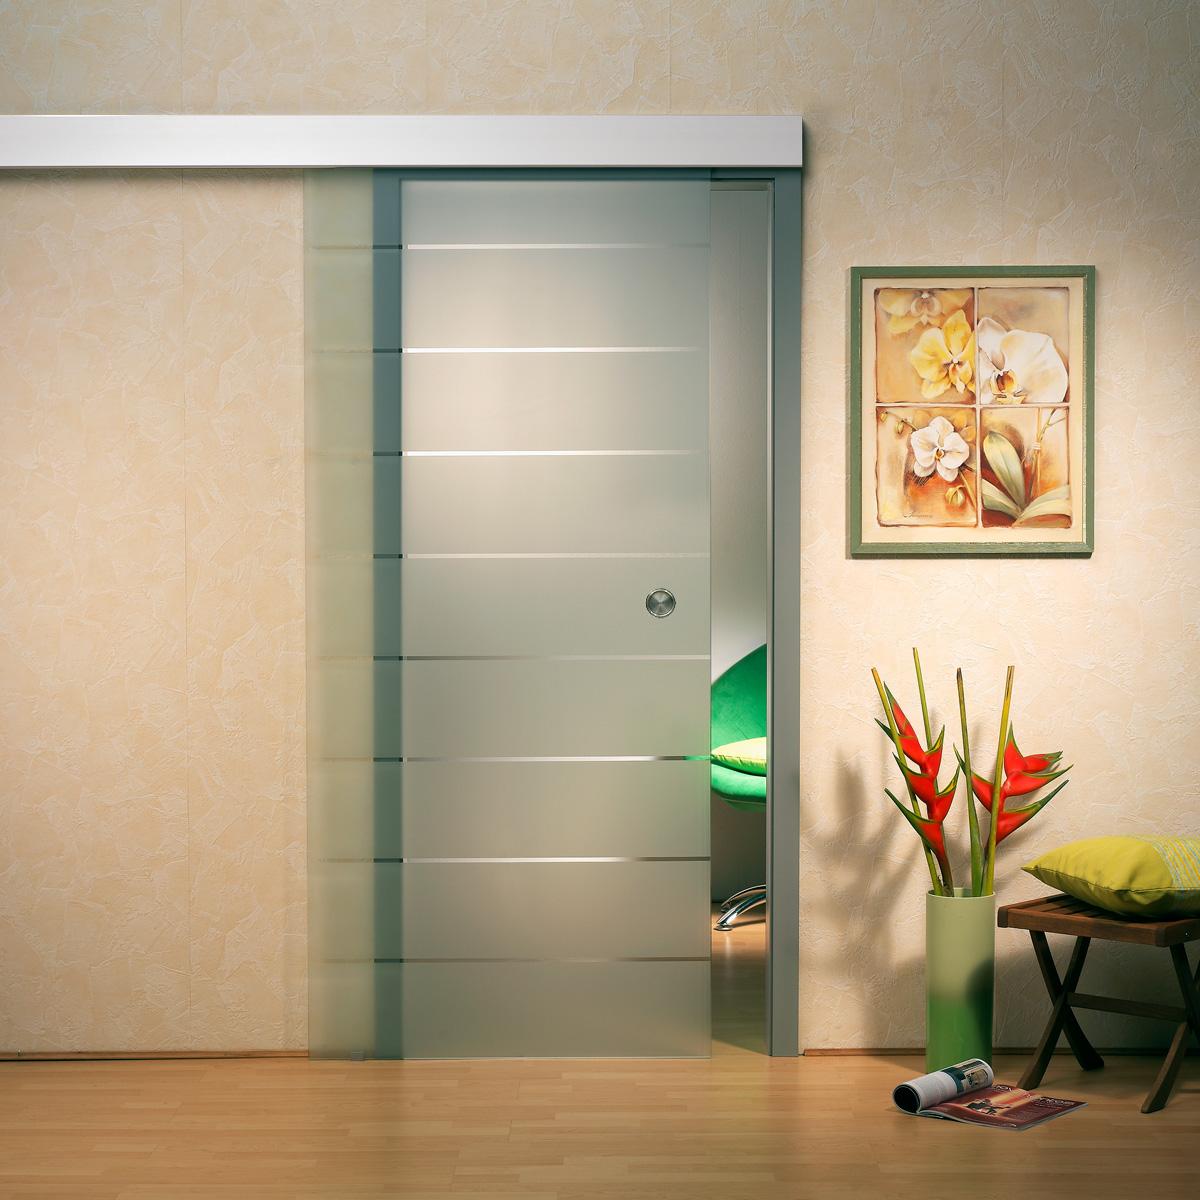 glasschiebet r sd734 alu60 klarglas streifendekor griffmuschel edelstahl ebay. Black Bedroom Furniture Sets. Home Design Ideas